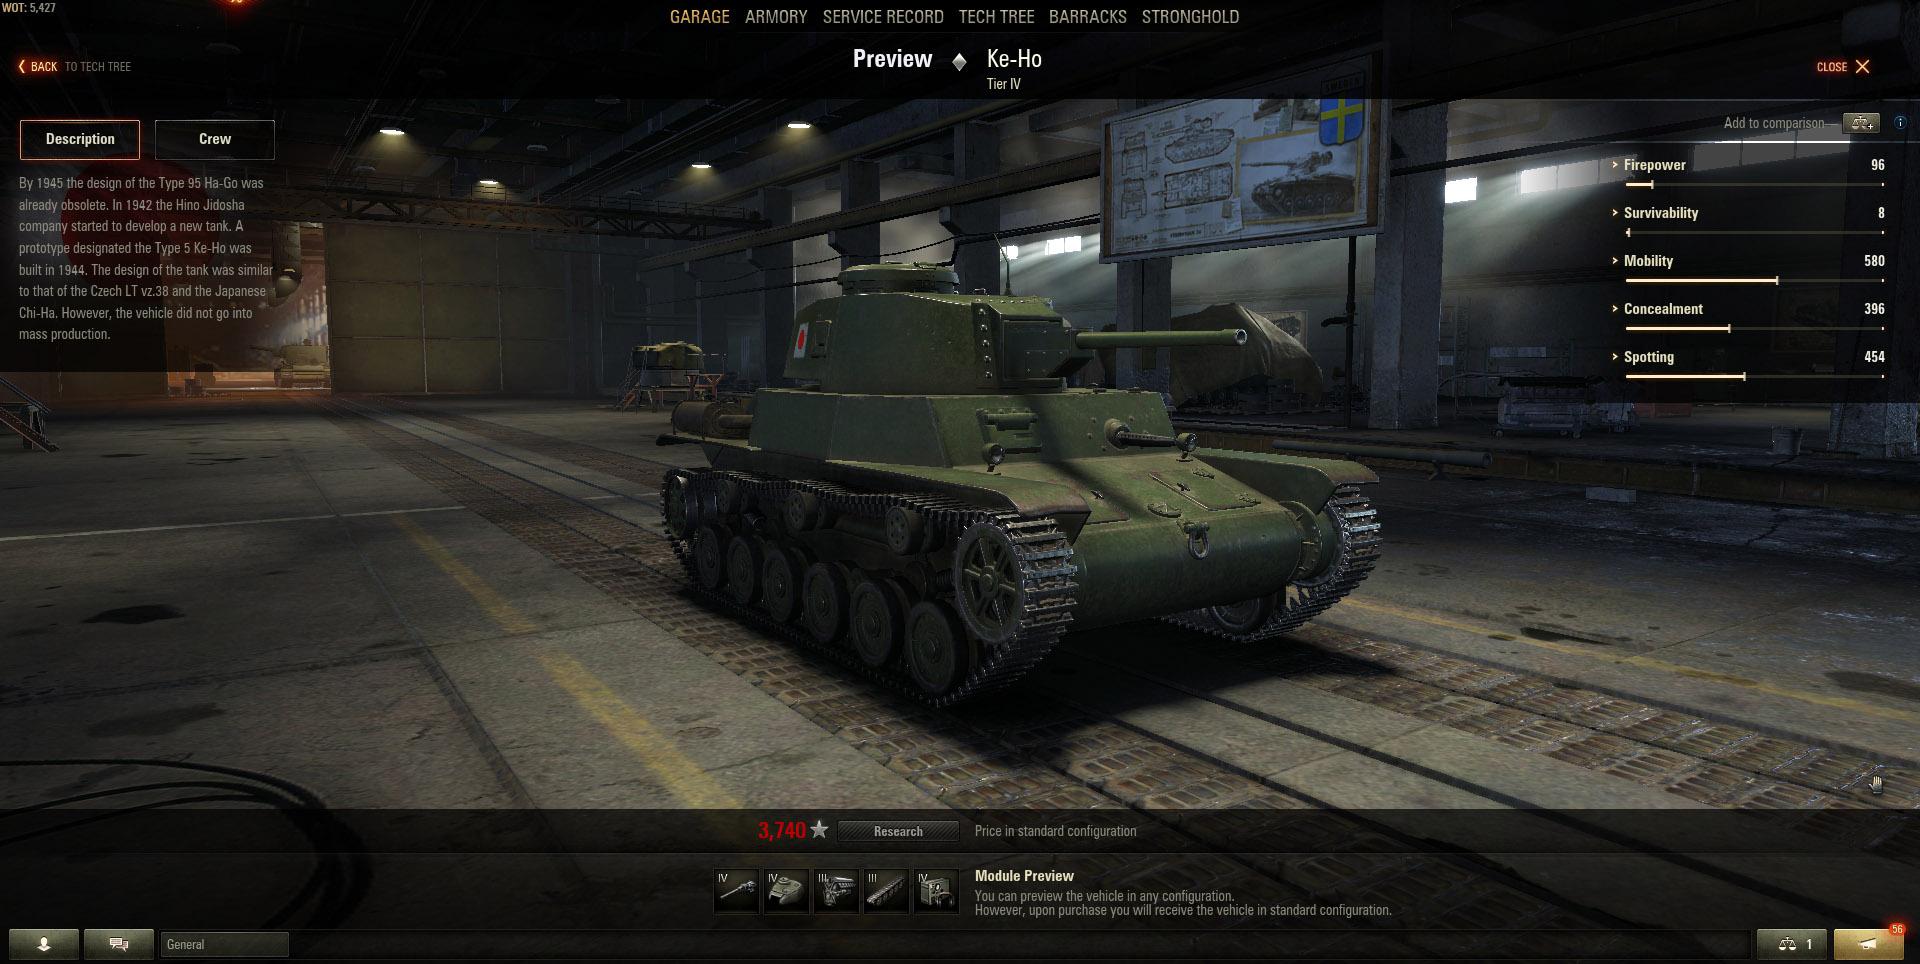 The Type 5 Ke-Ho is a small and nimble Japanese Light tank.